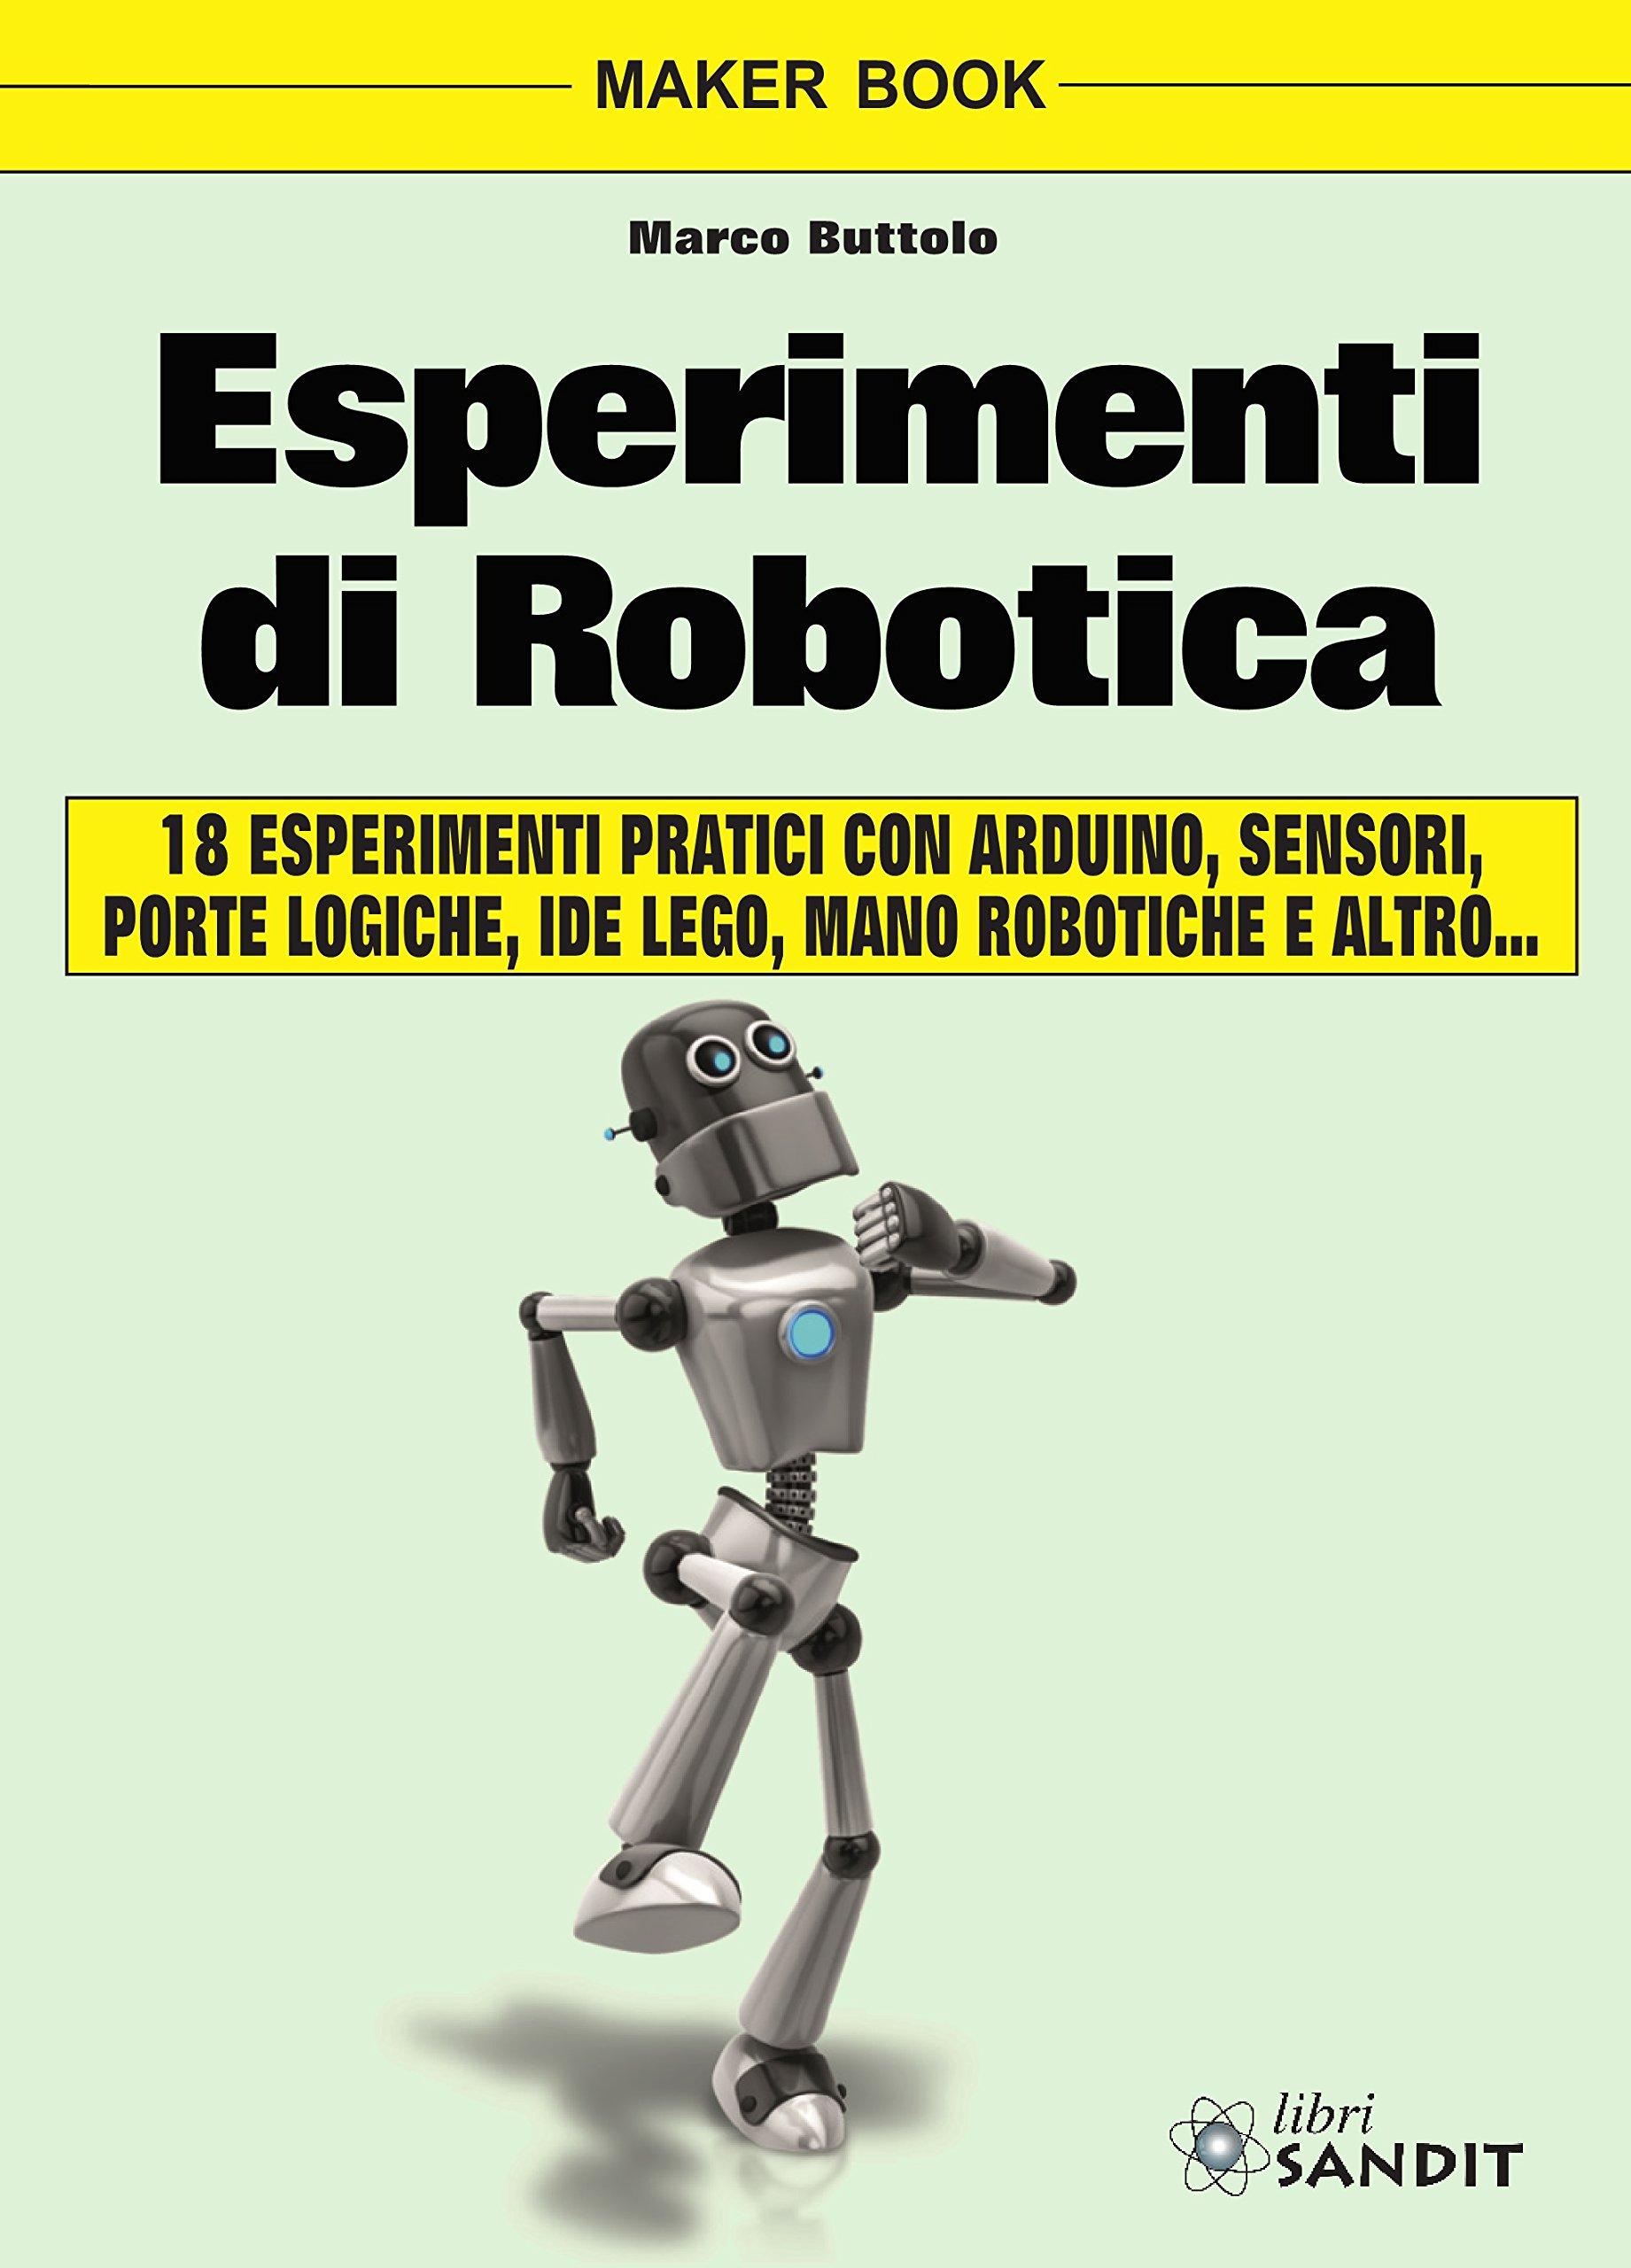 Esperimenti di robotica (Elettronica): Amazon.es: Buttolo, Marco: Libros en idiomas extranjeros